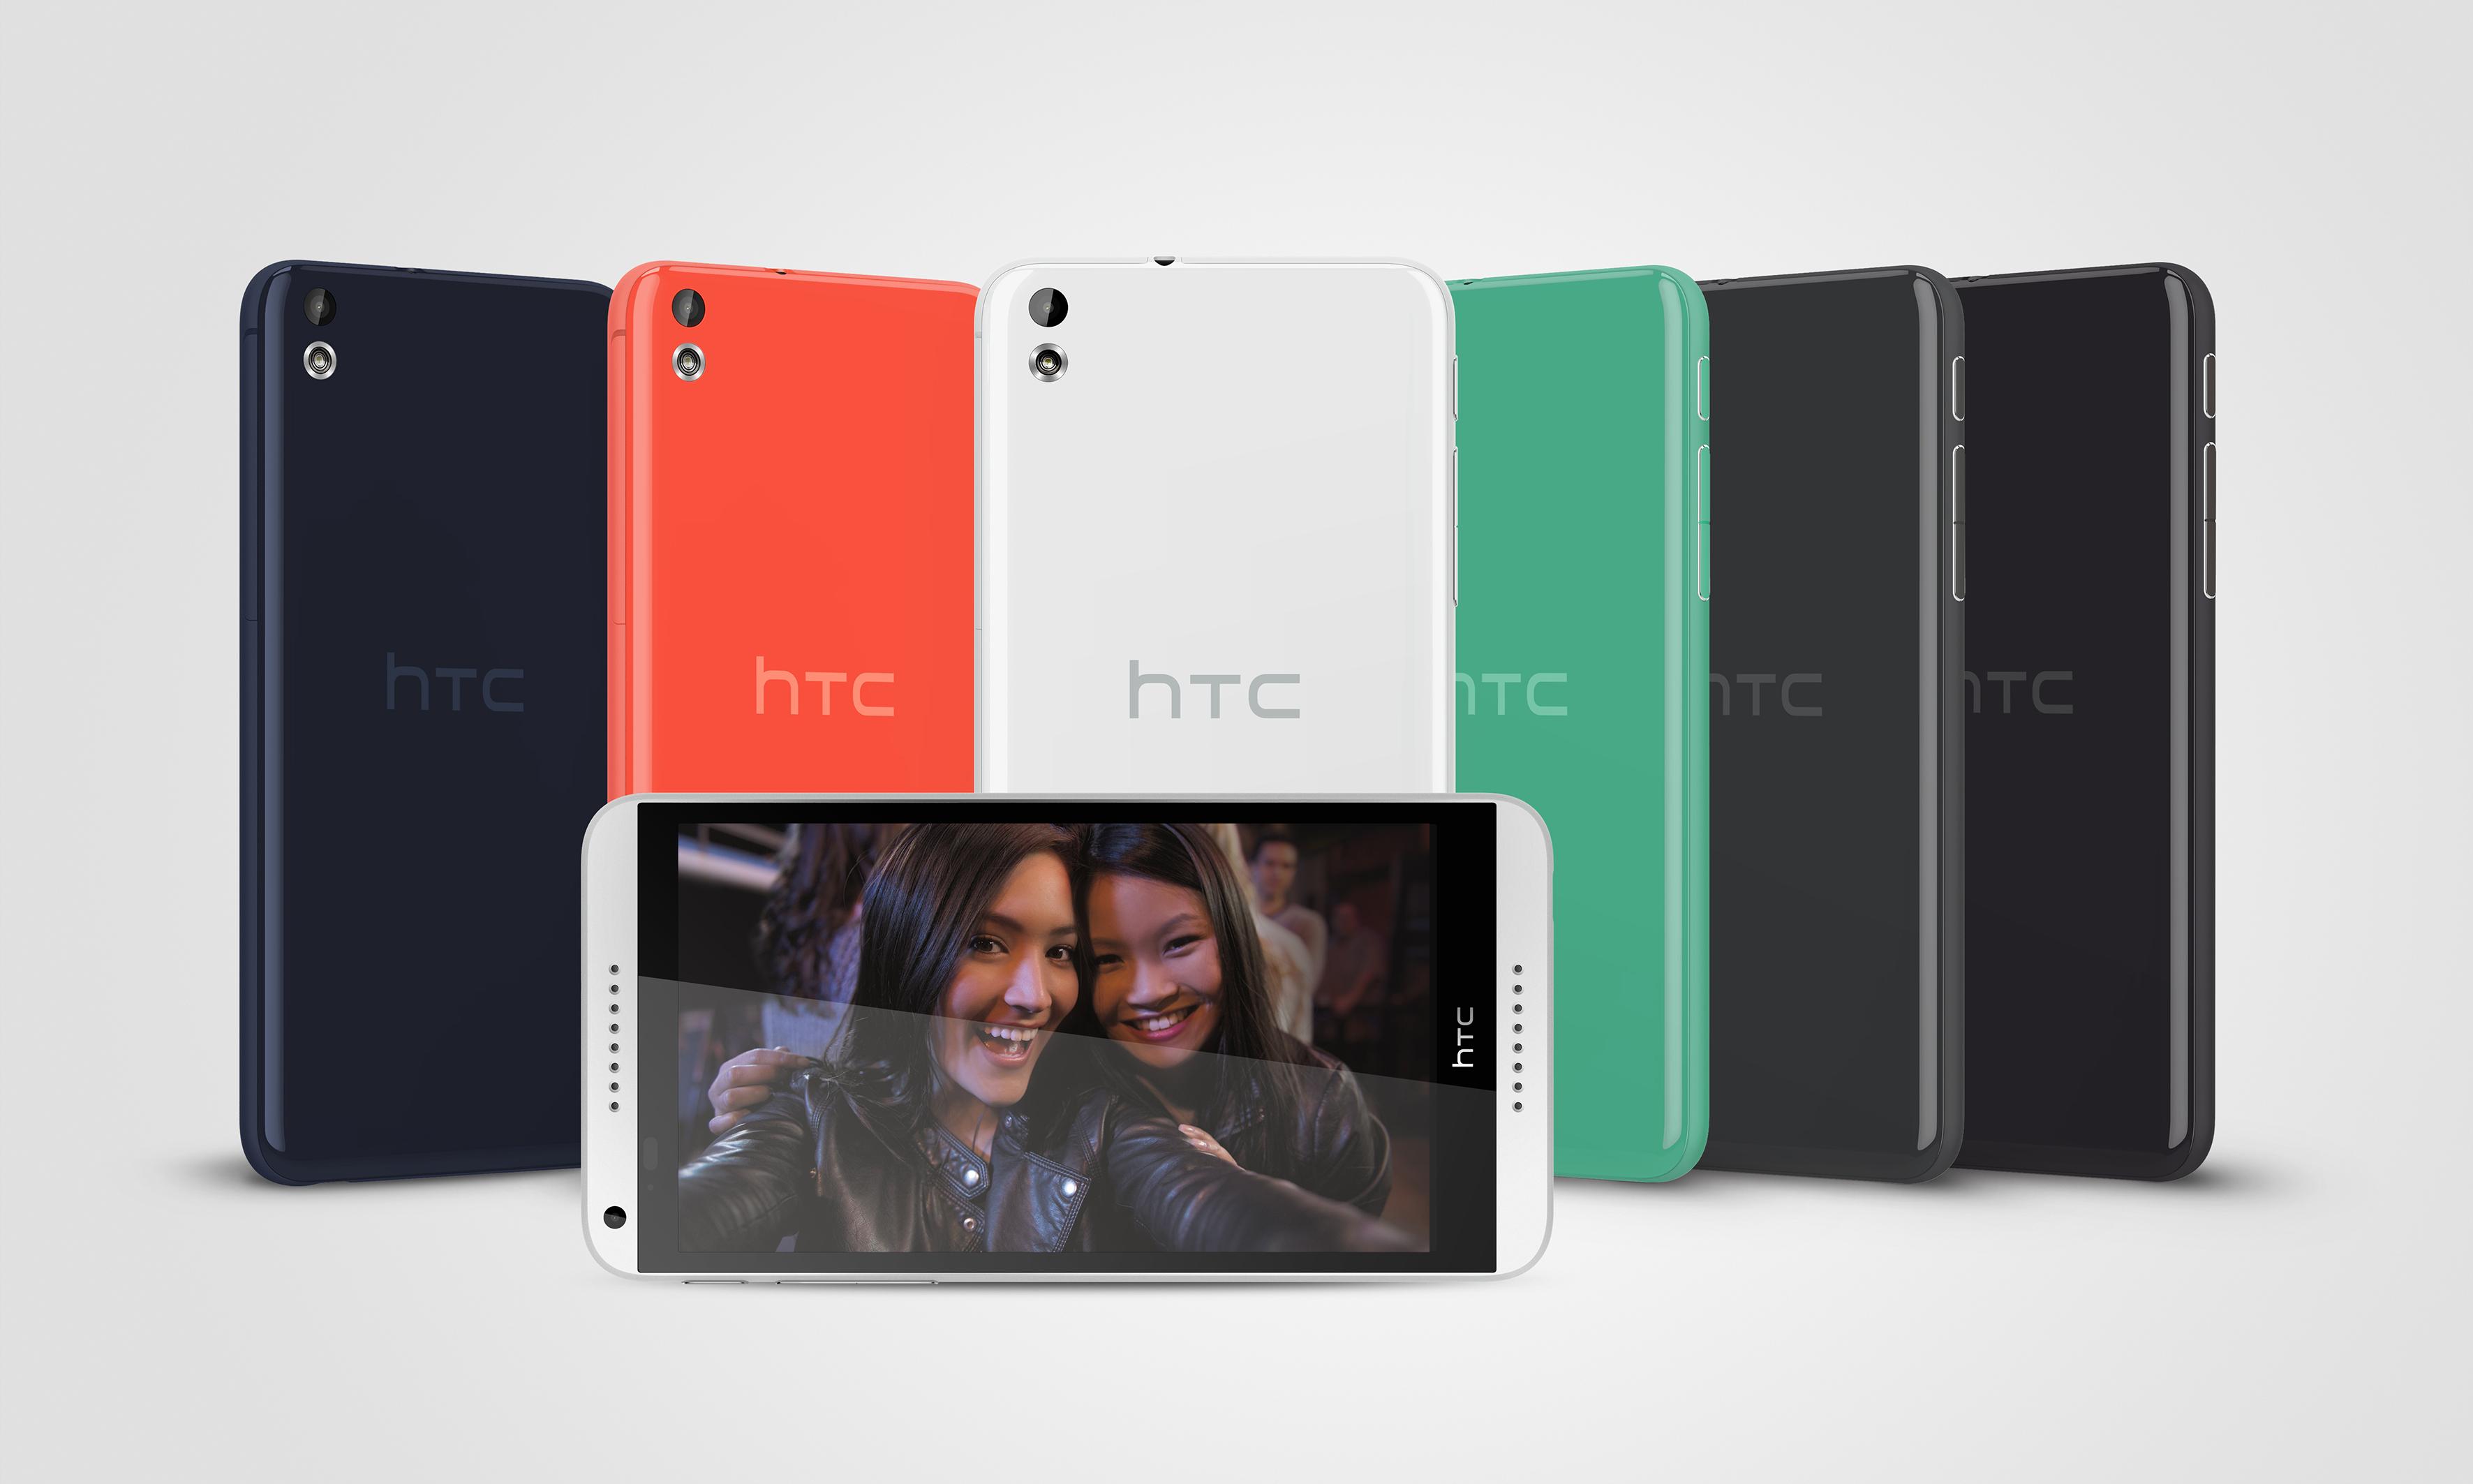 HTC Desire 816 All Colors